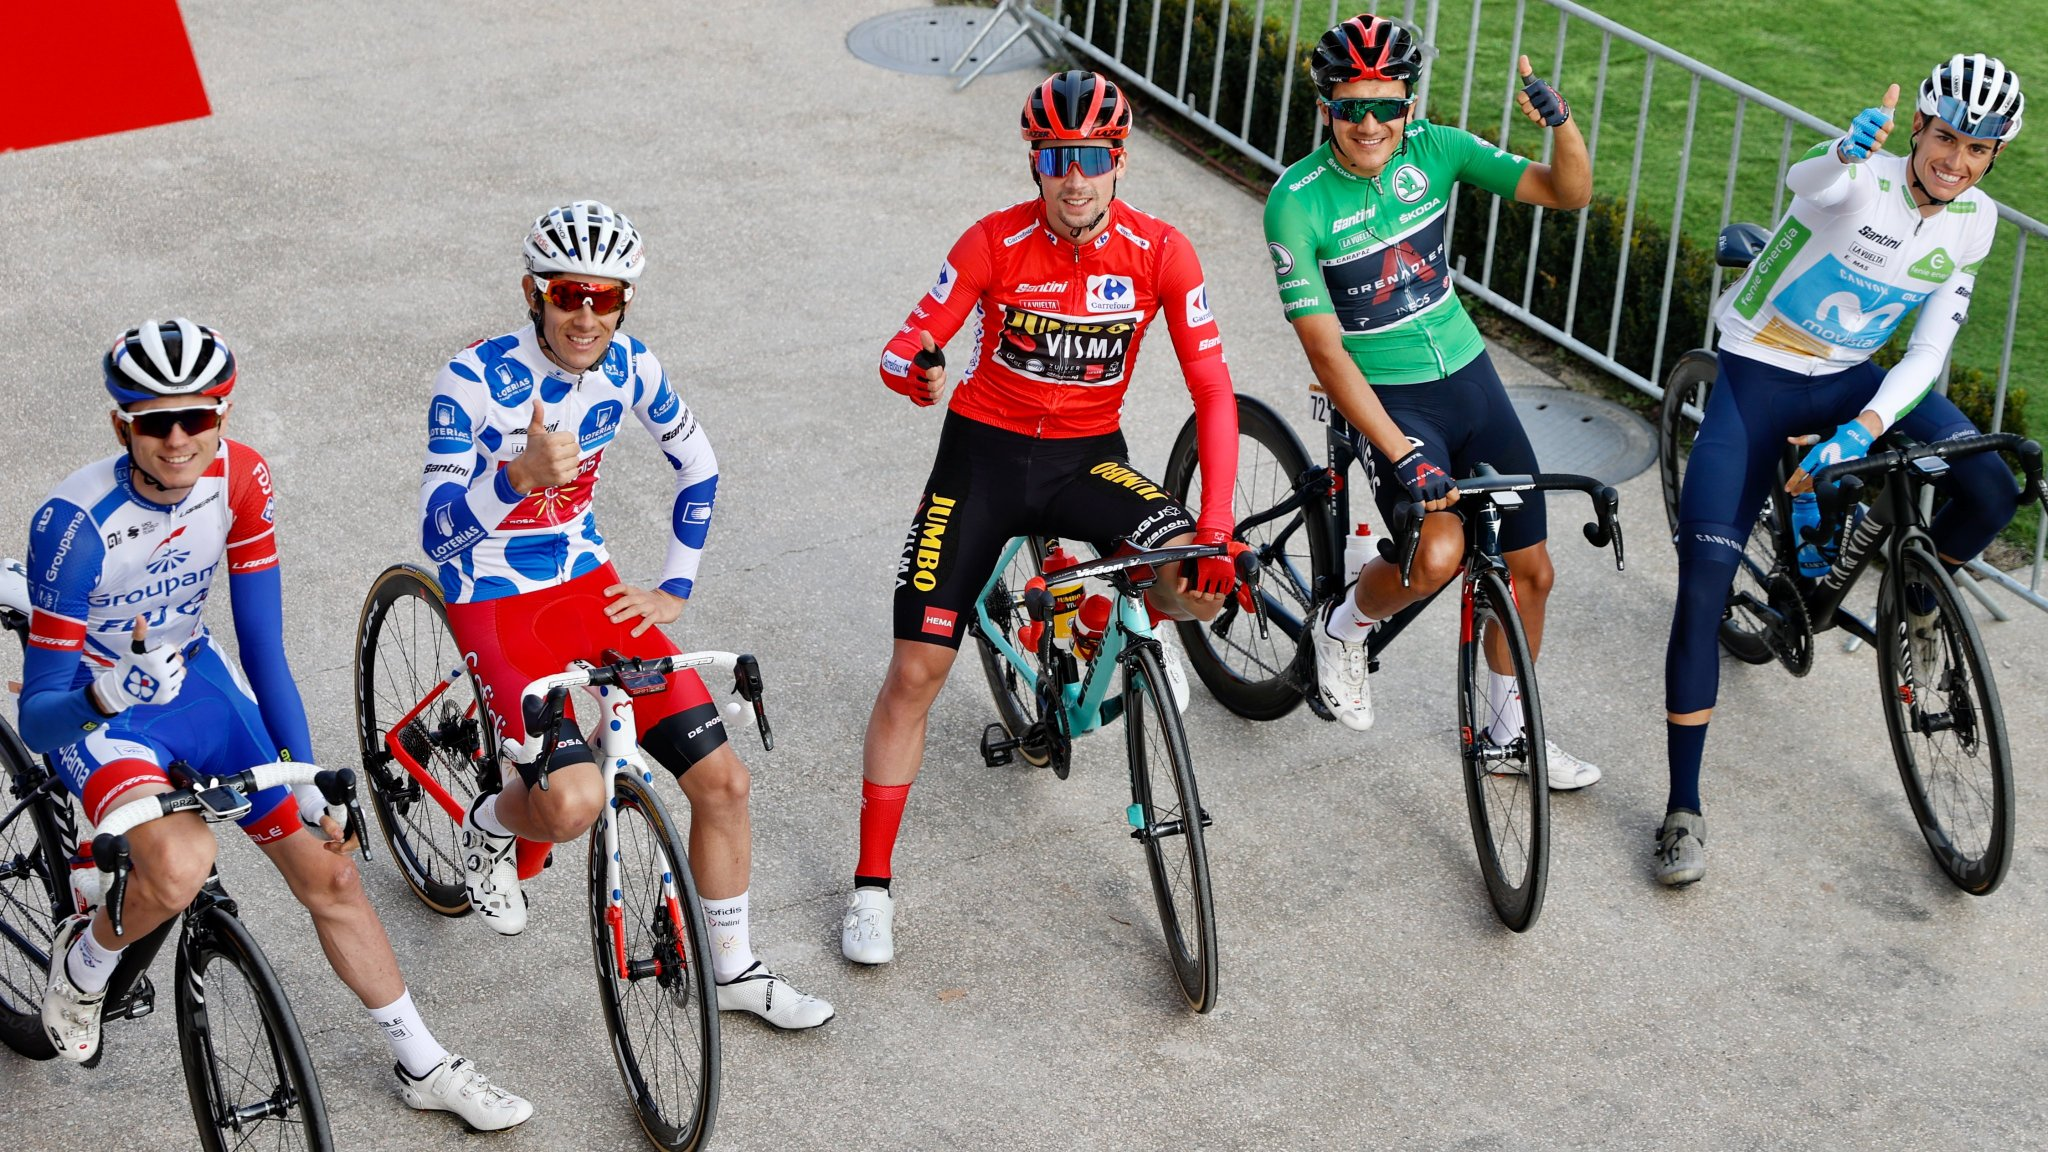 cycling vuelta 2020 classification jerseys